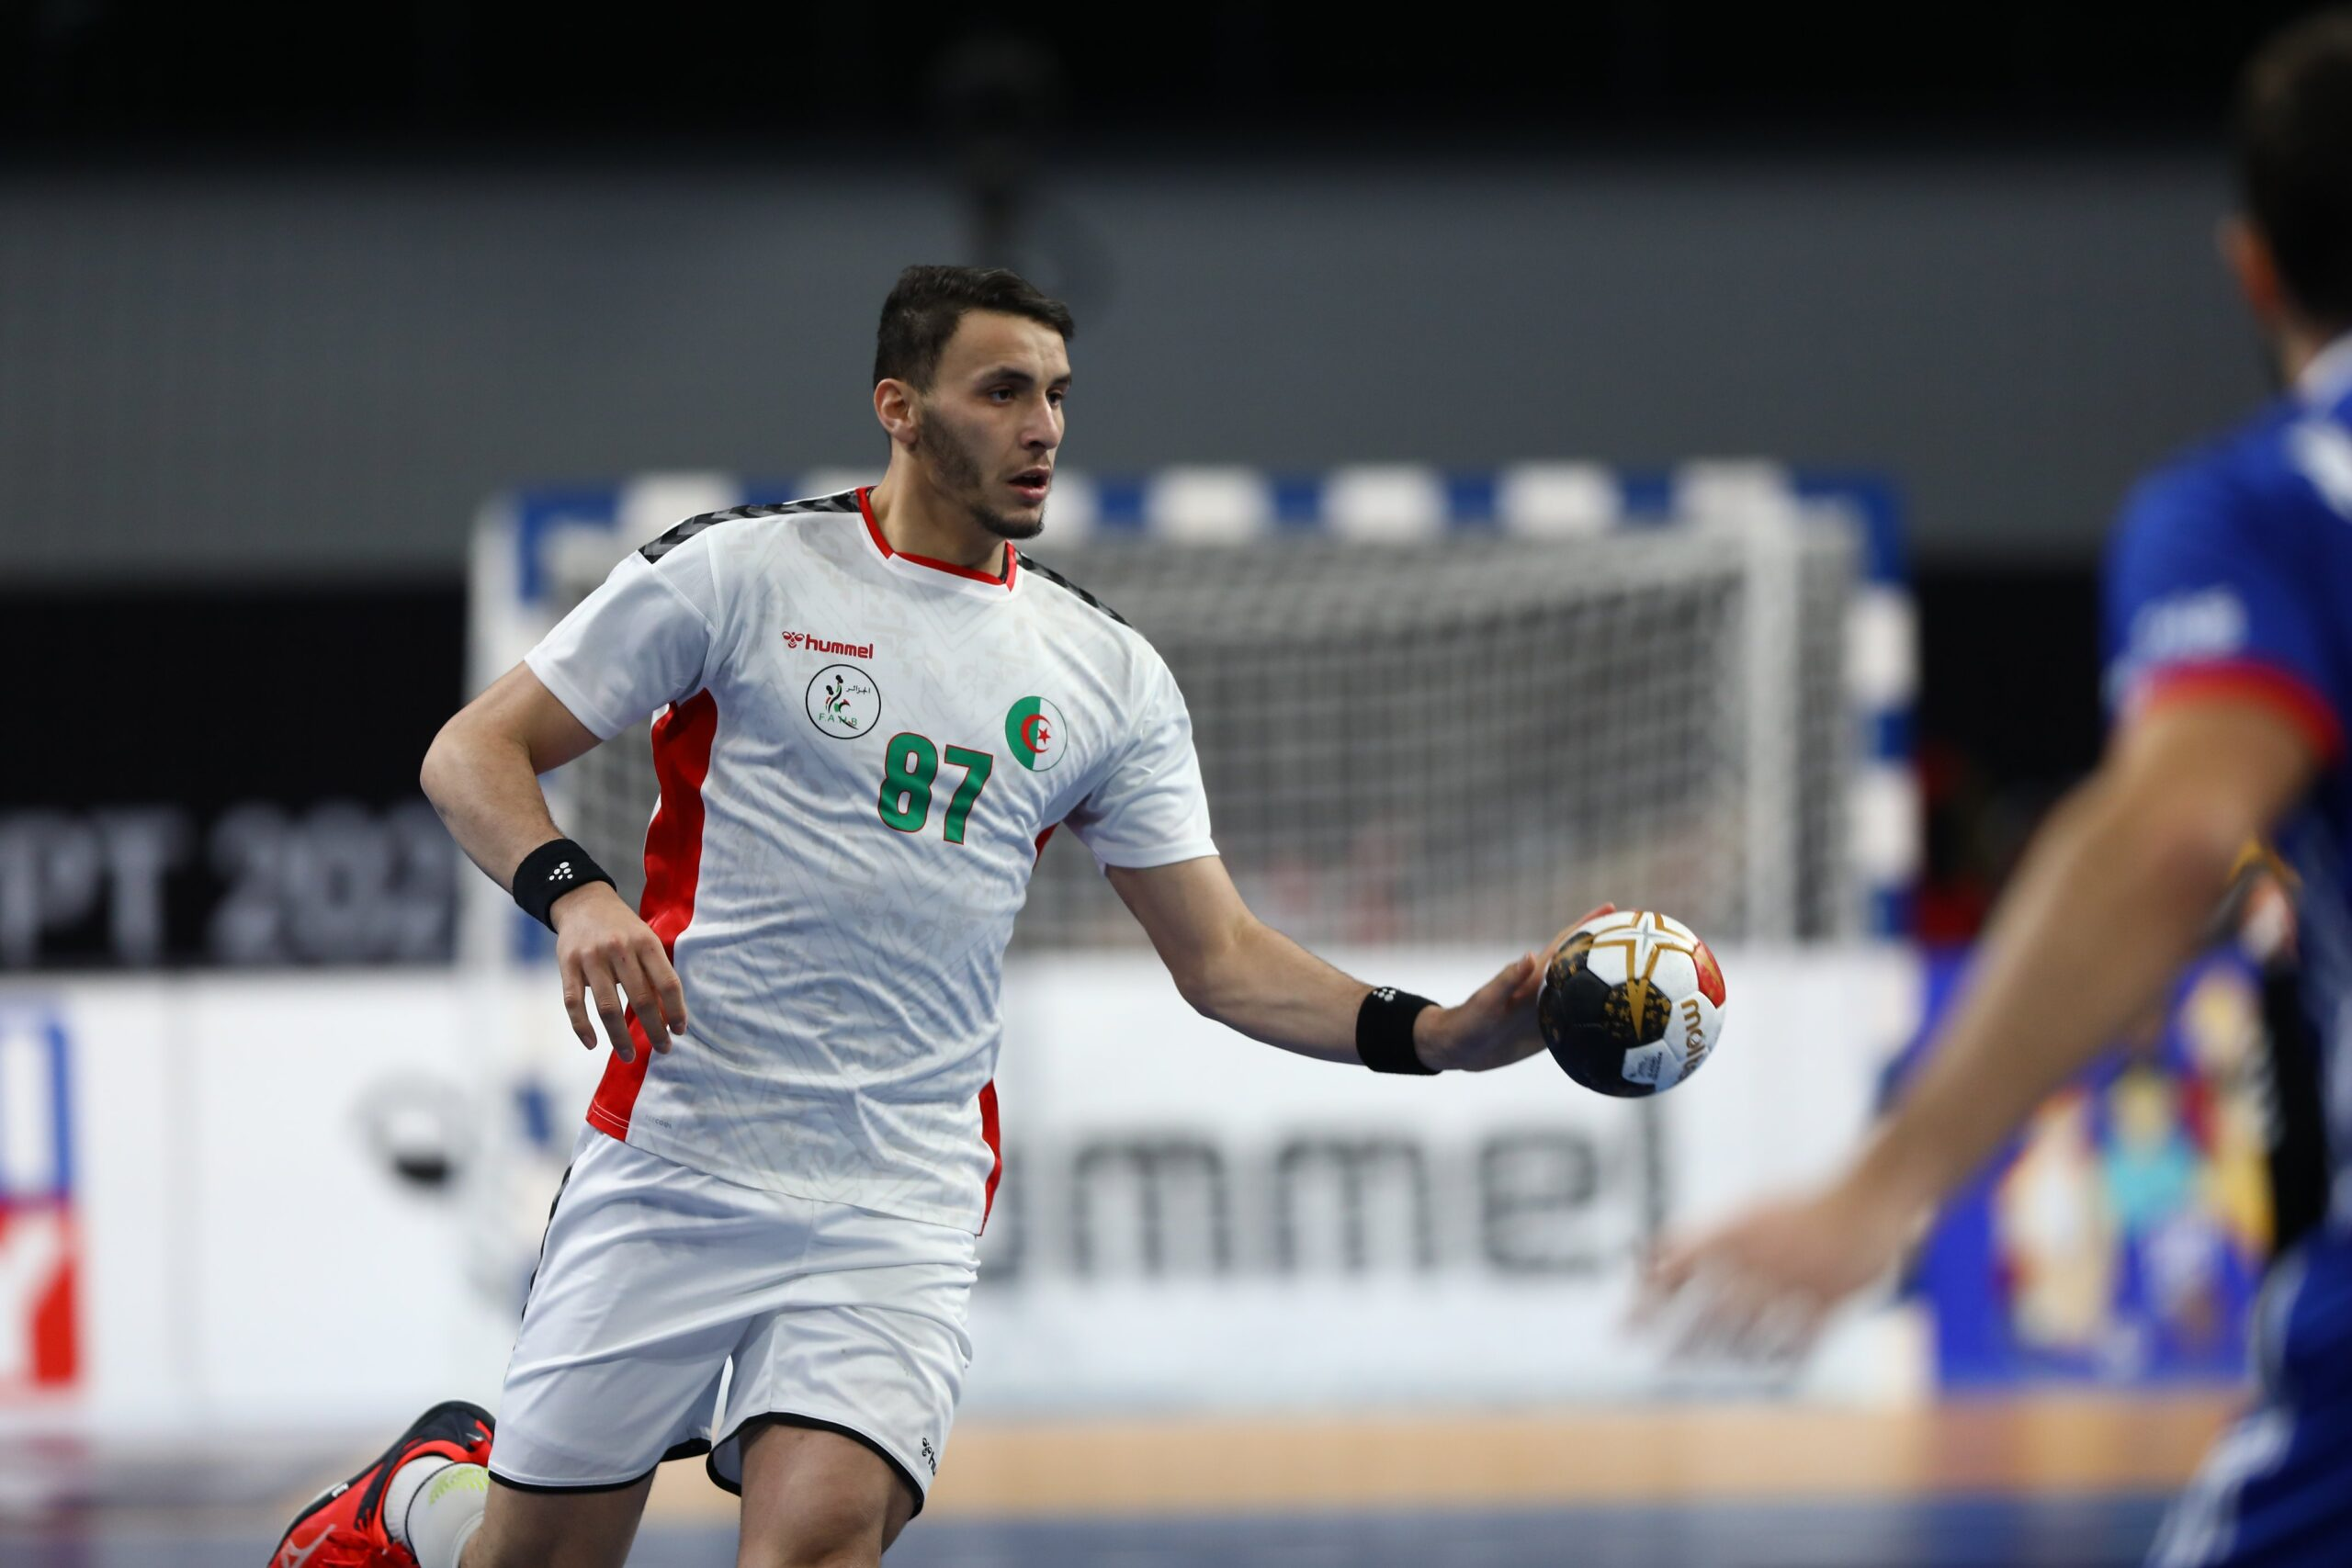 ayoub abdi algerie france handball egypt2021